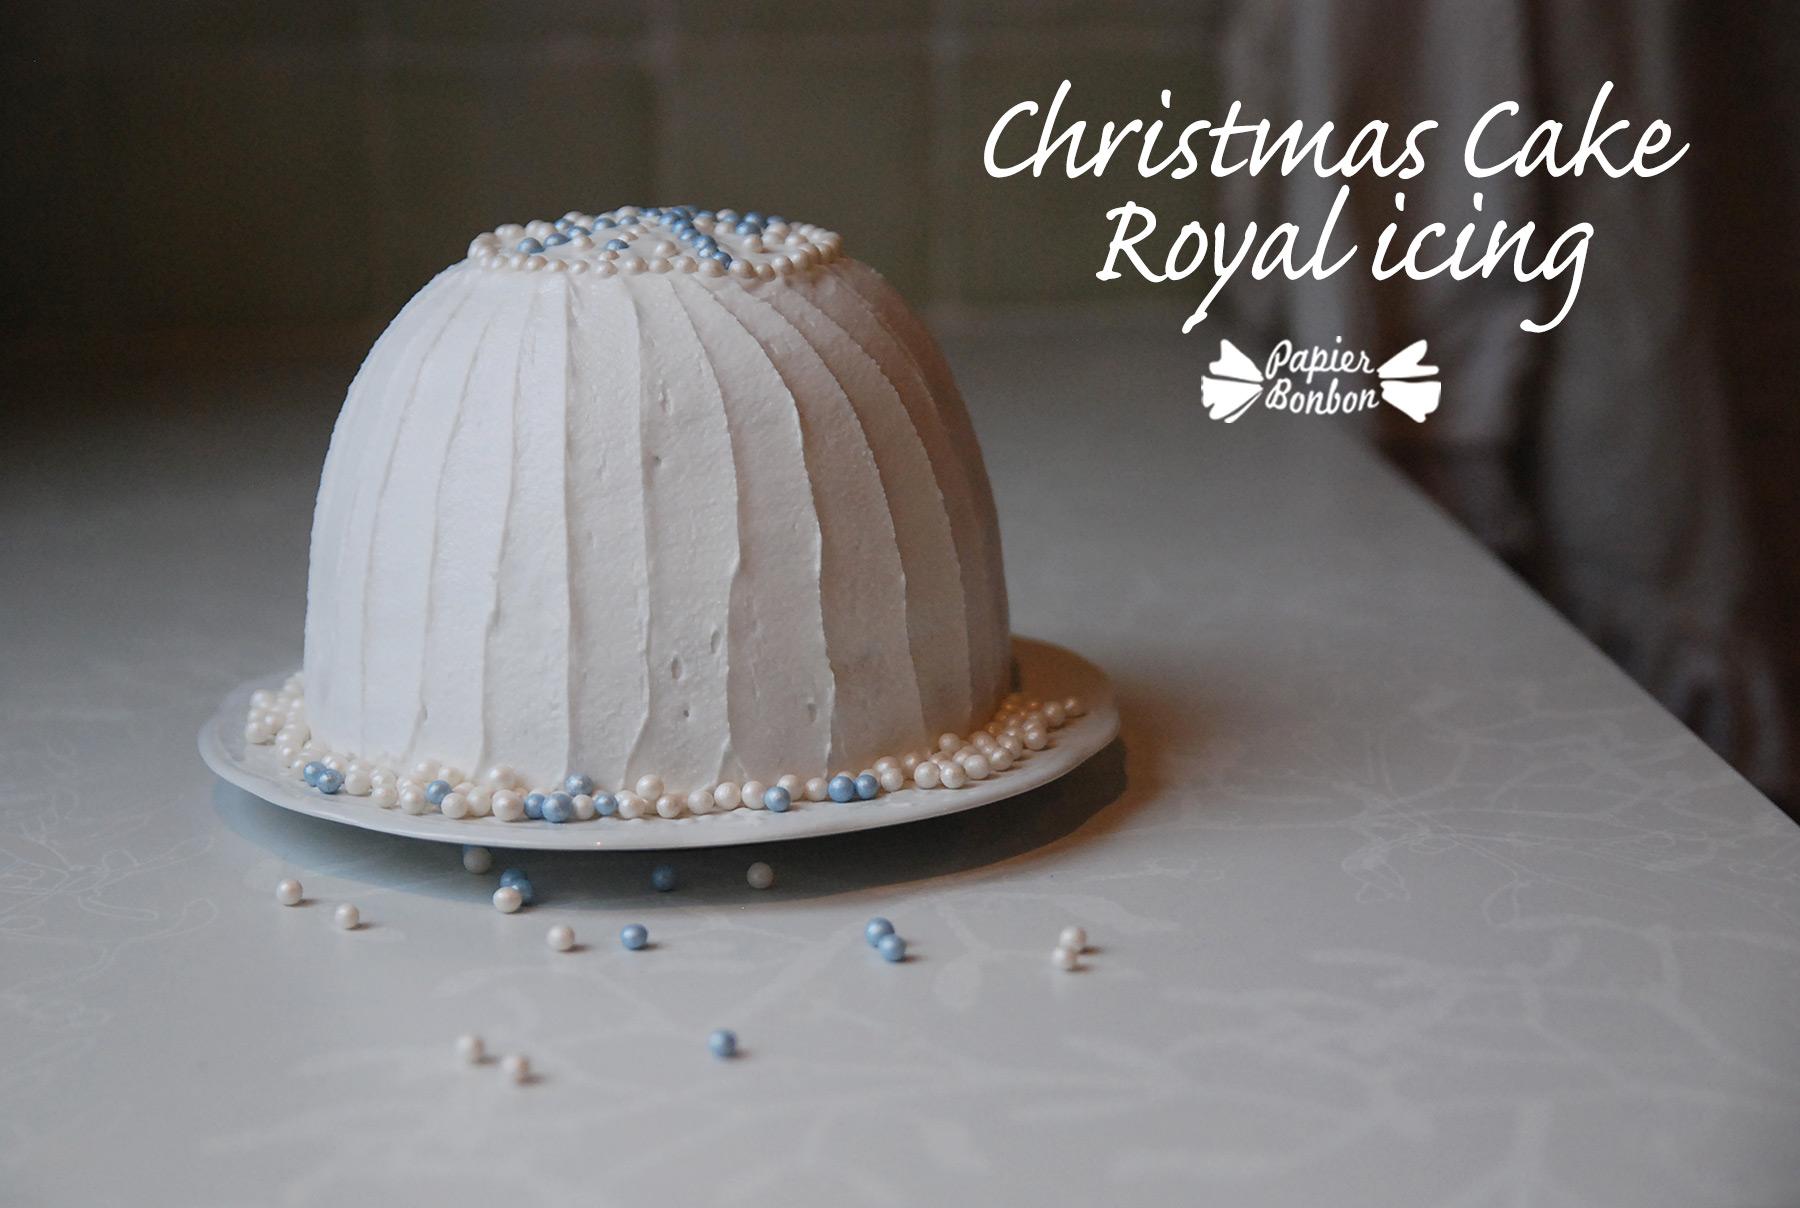 Christmas Cake #3 - Royal Icing - Papier Bonbon